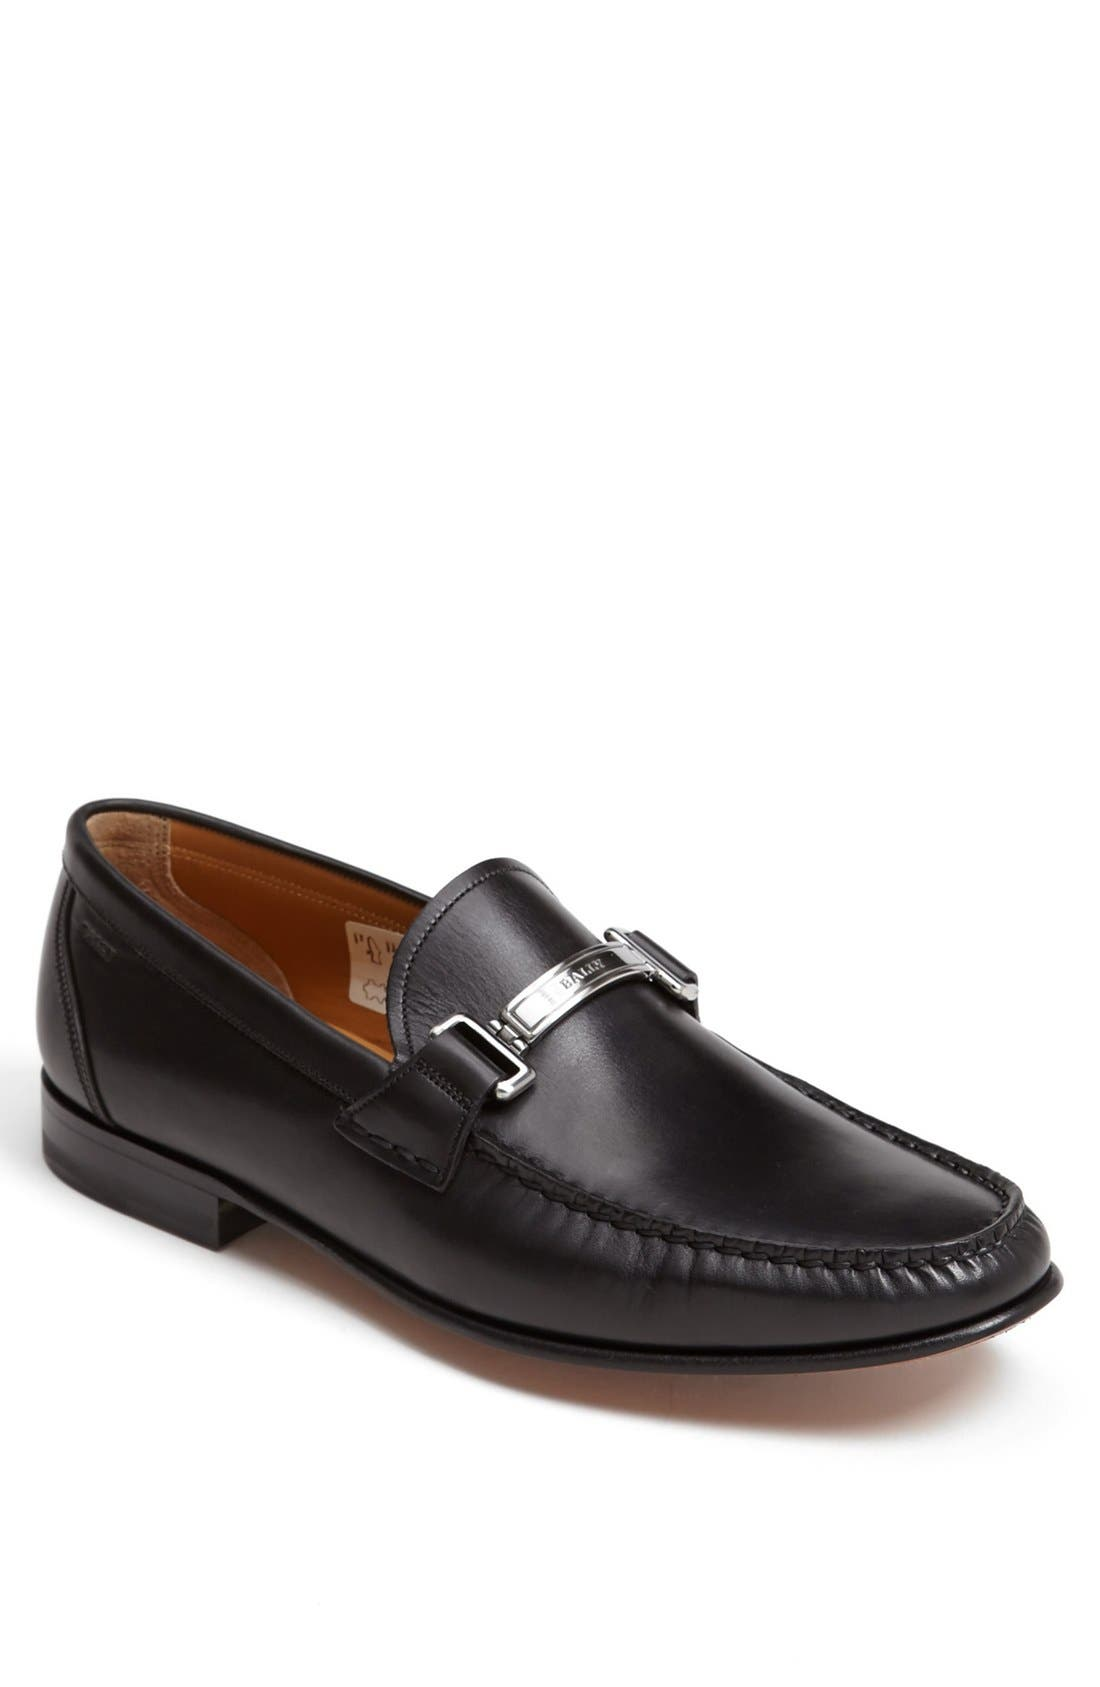 Main Image - Bally 'Tecno' Loafer (Men)